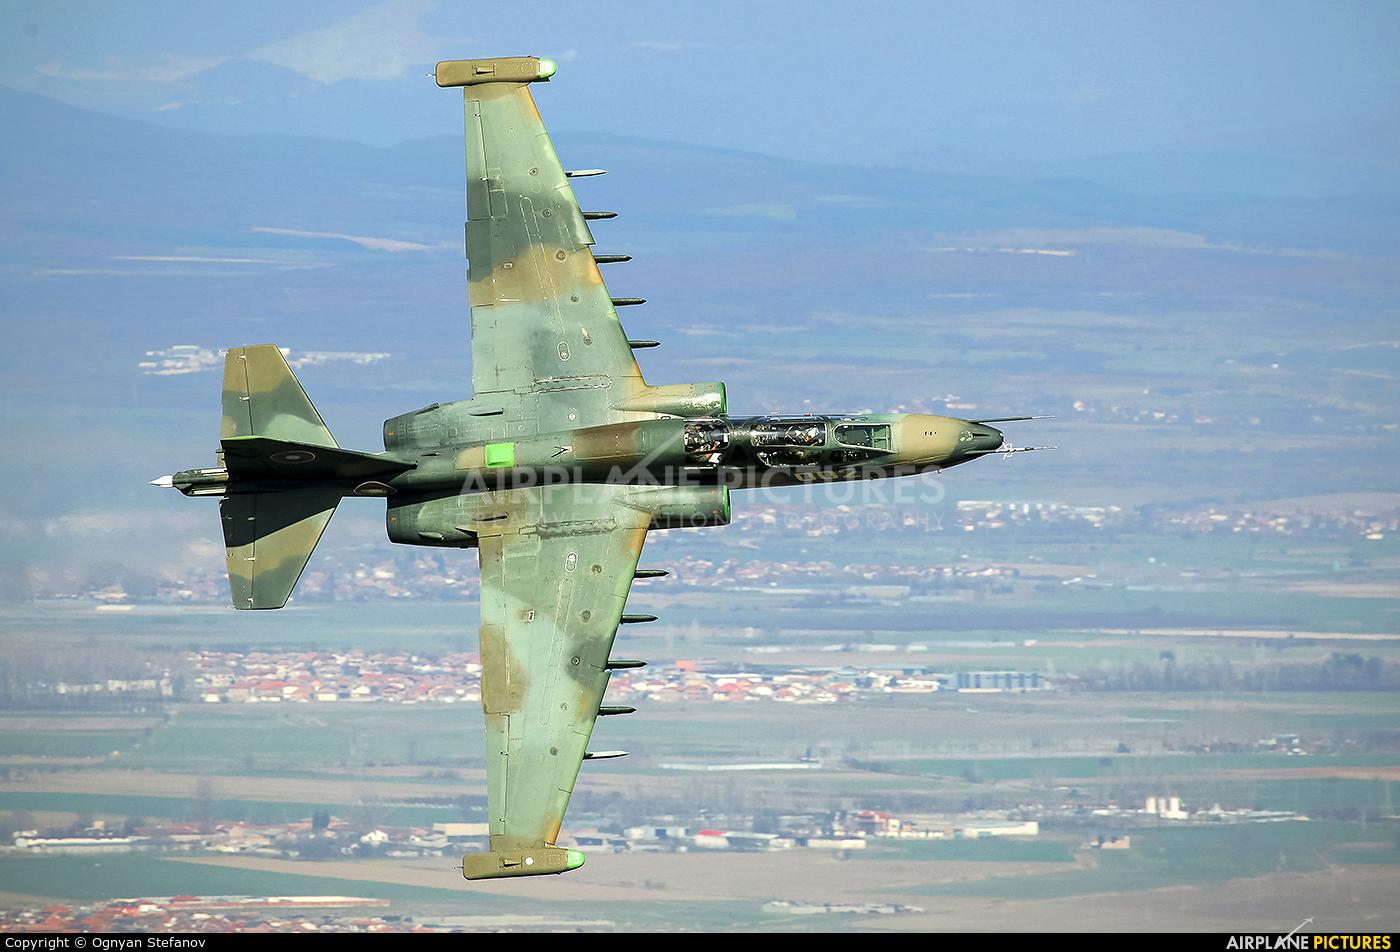 Bulgaria - Air Force 002 aircraft at In Flight - Bulgaria